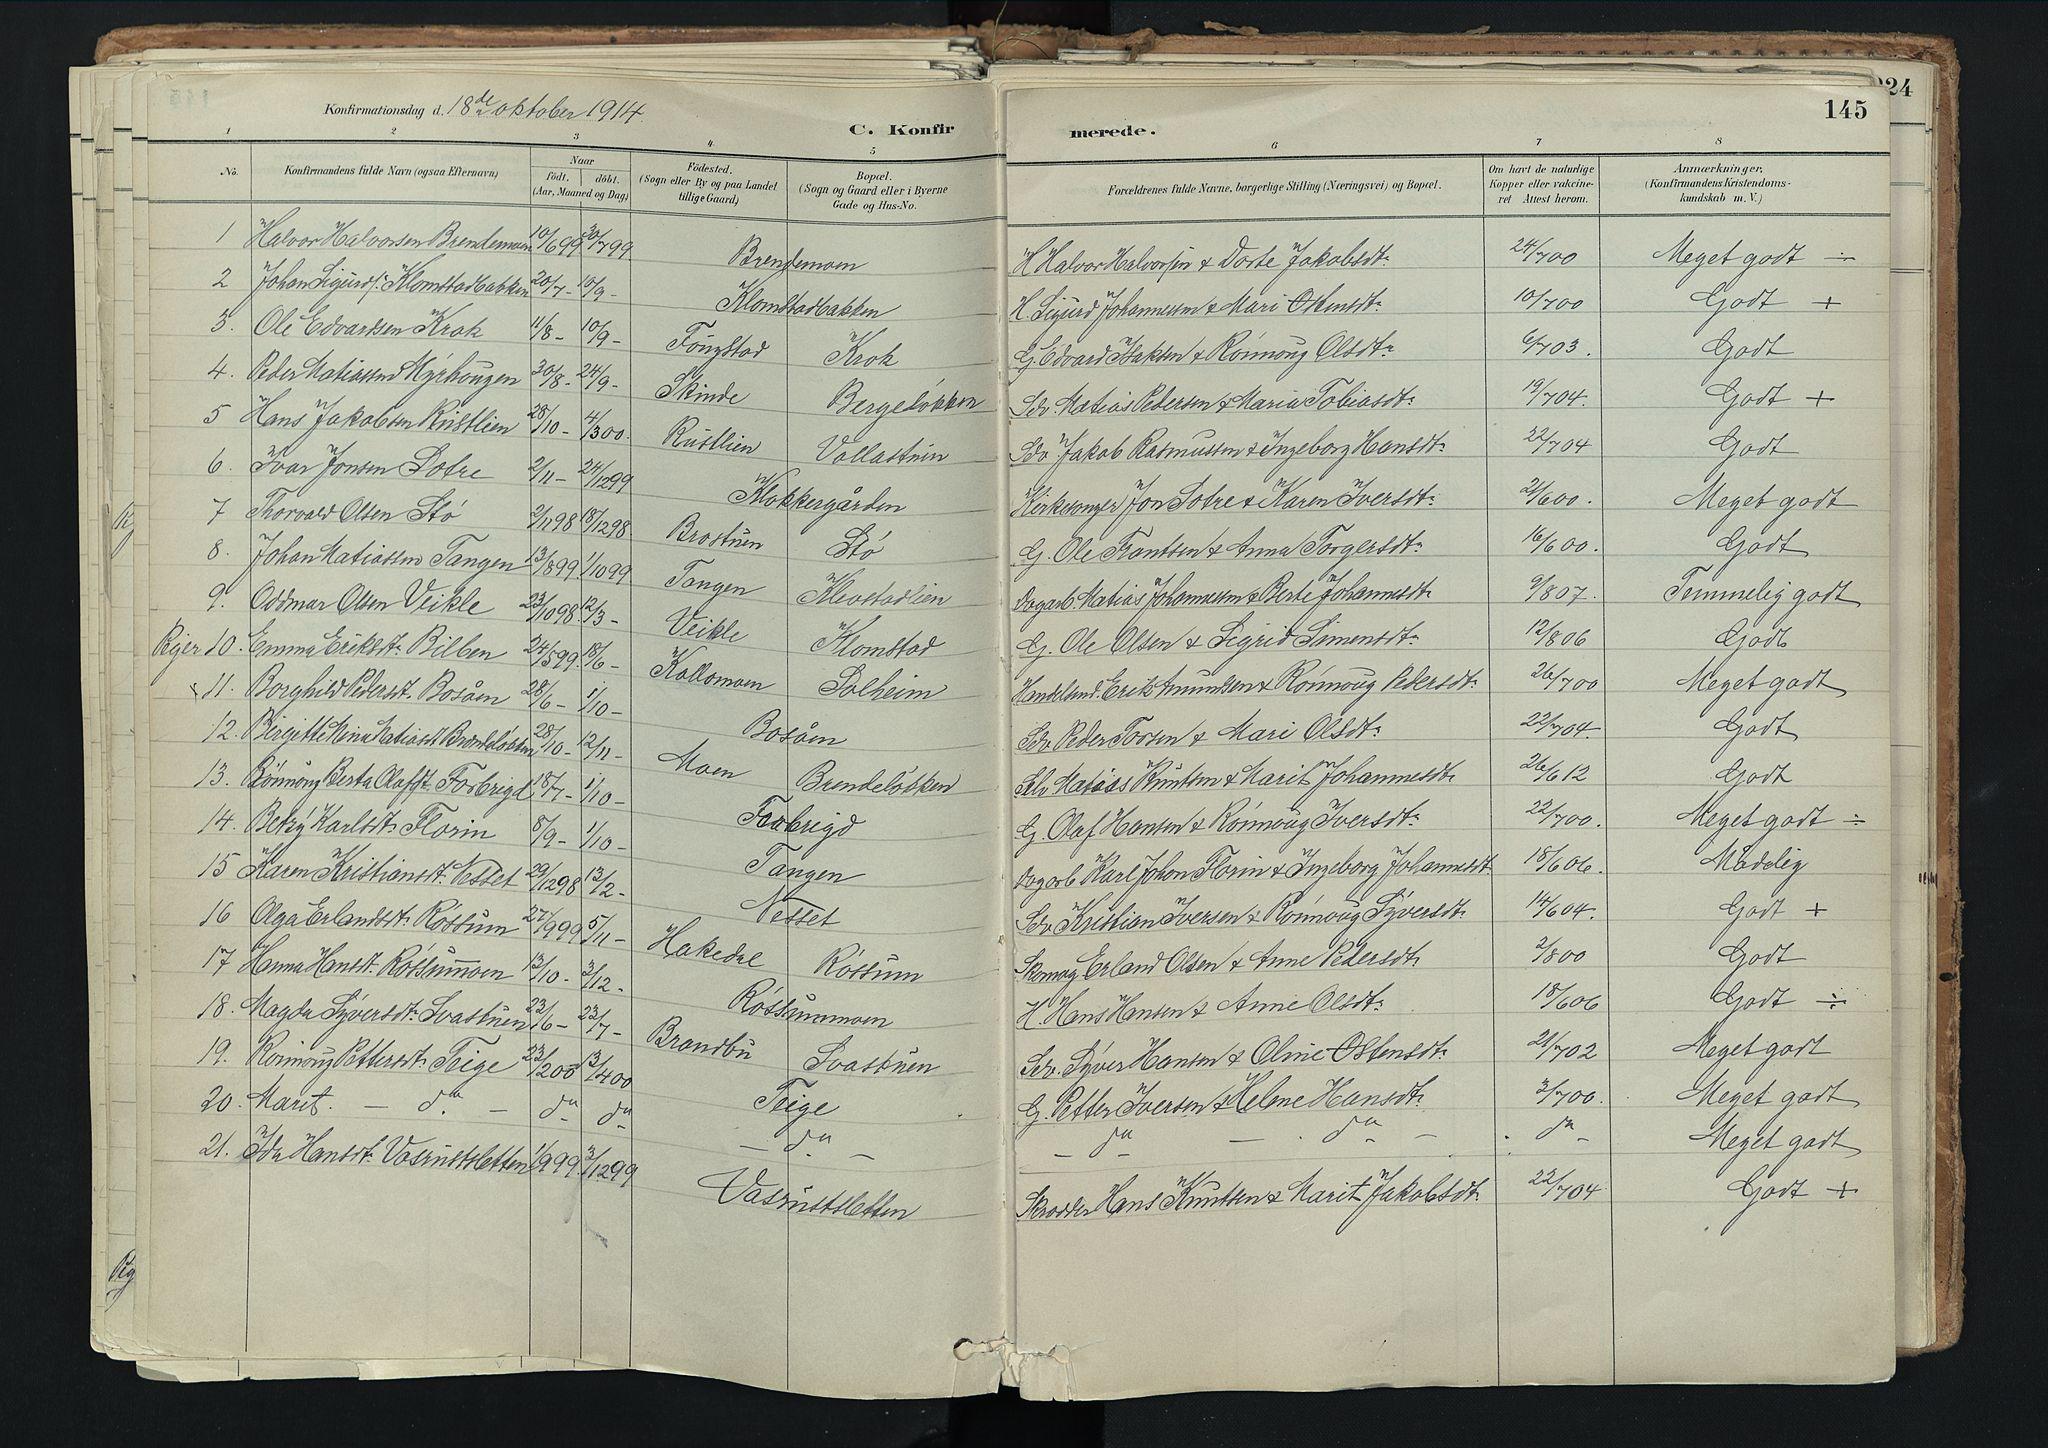 SAH, Nord-Fron prestekontor, Ministerialbok nr. 3, 1884-1914, s. 145